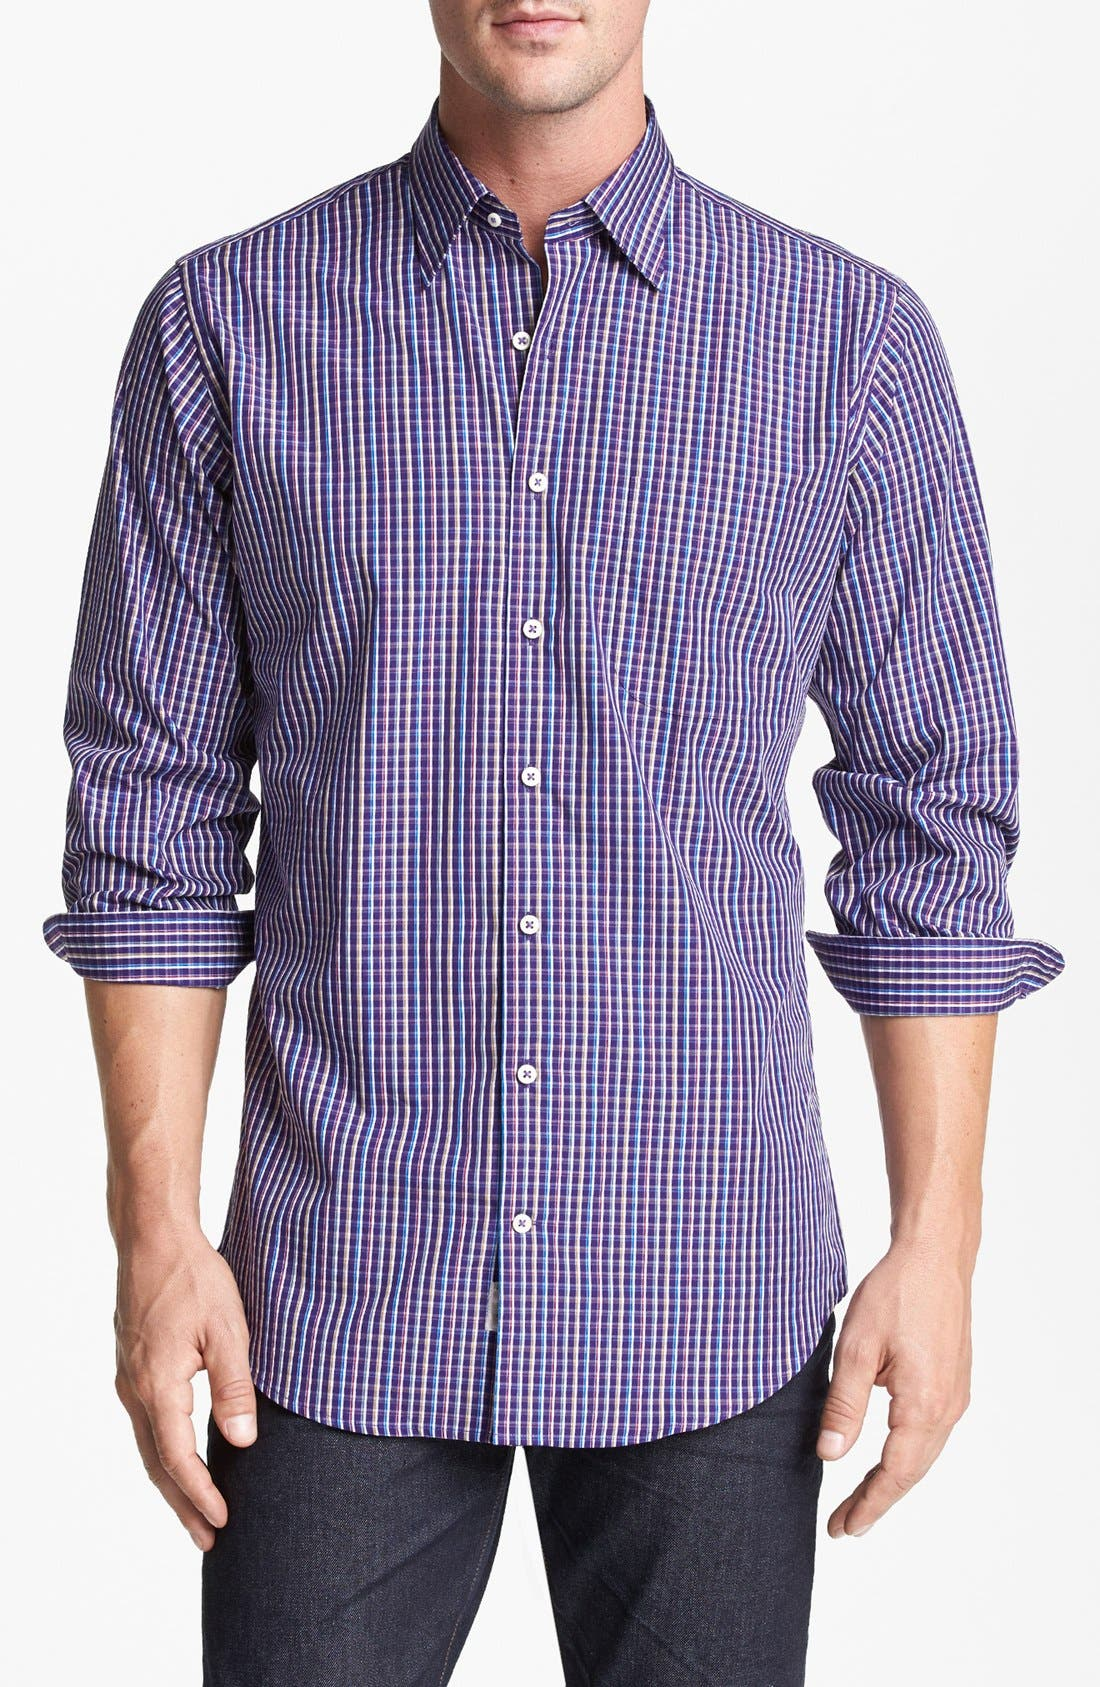 Alternate Image 1 Selected - Peter Millar Regular Fit Sport Shirt (Tall)